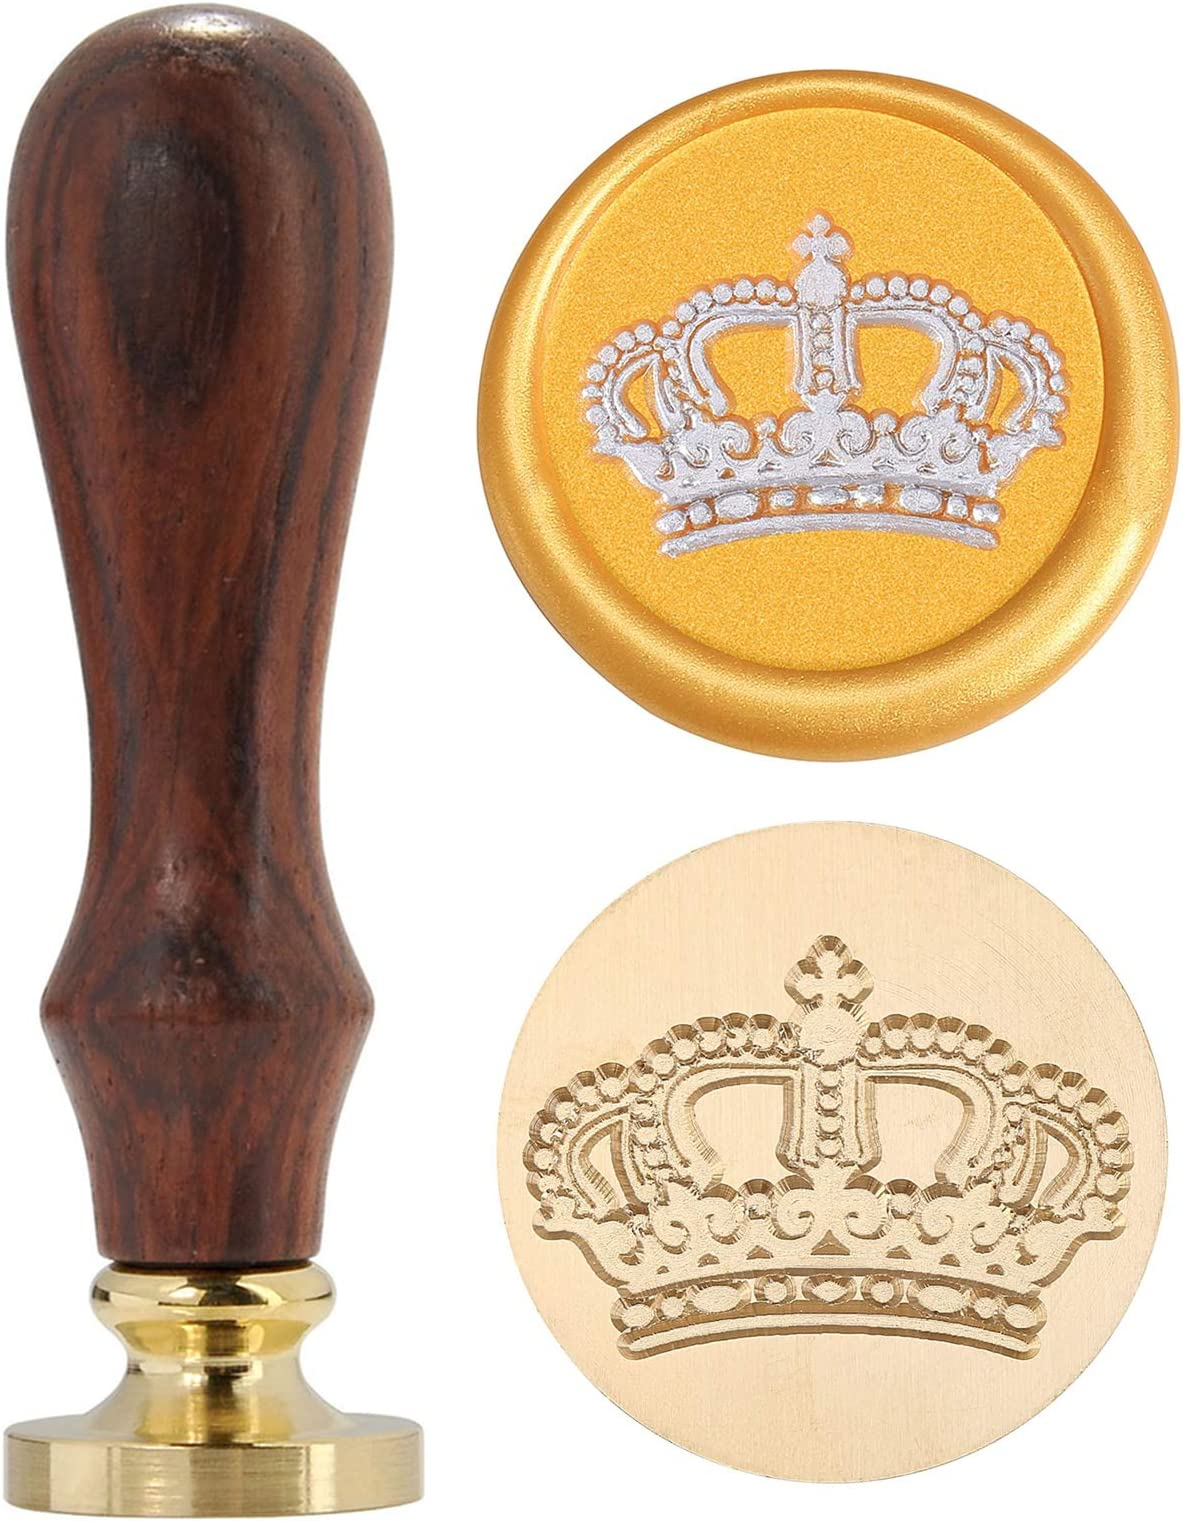 sealing wax stamp,seal stamp wedding,wedding stamp wax-M217 MAD MAX  wax seal stamp